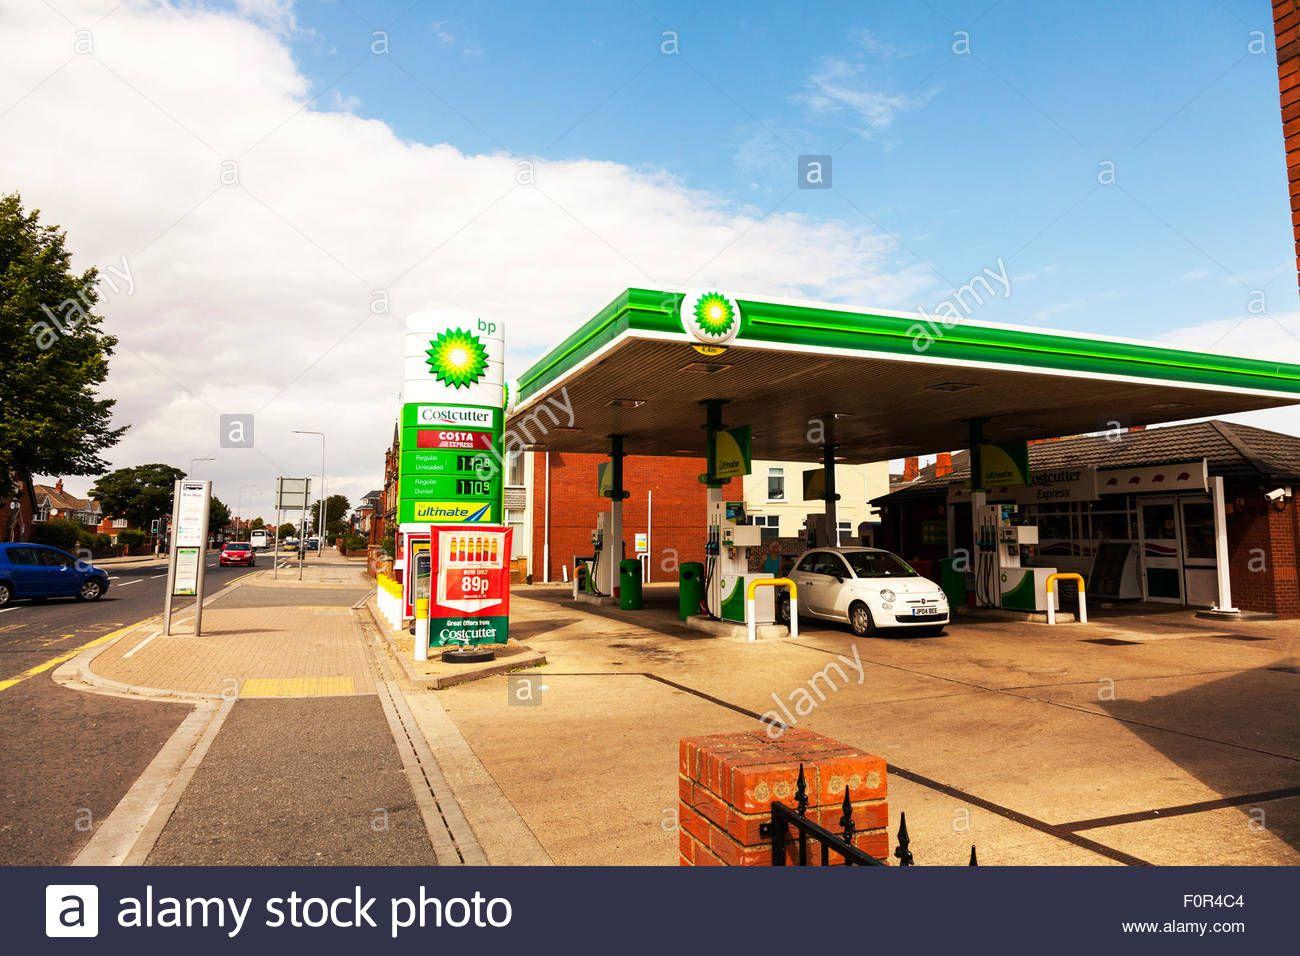 Download this stock image: BP petrol station British Petroleum pumps